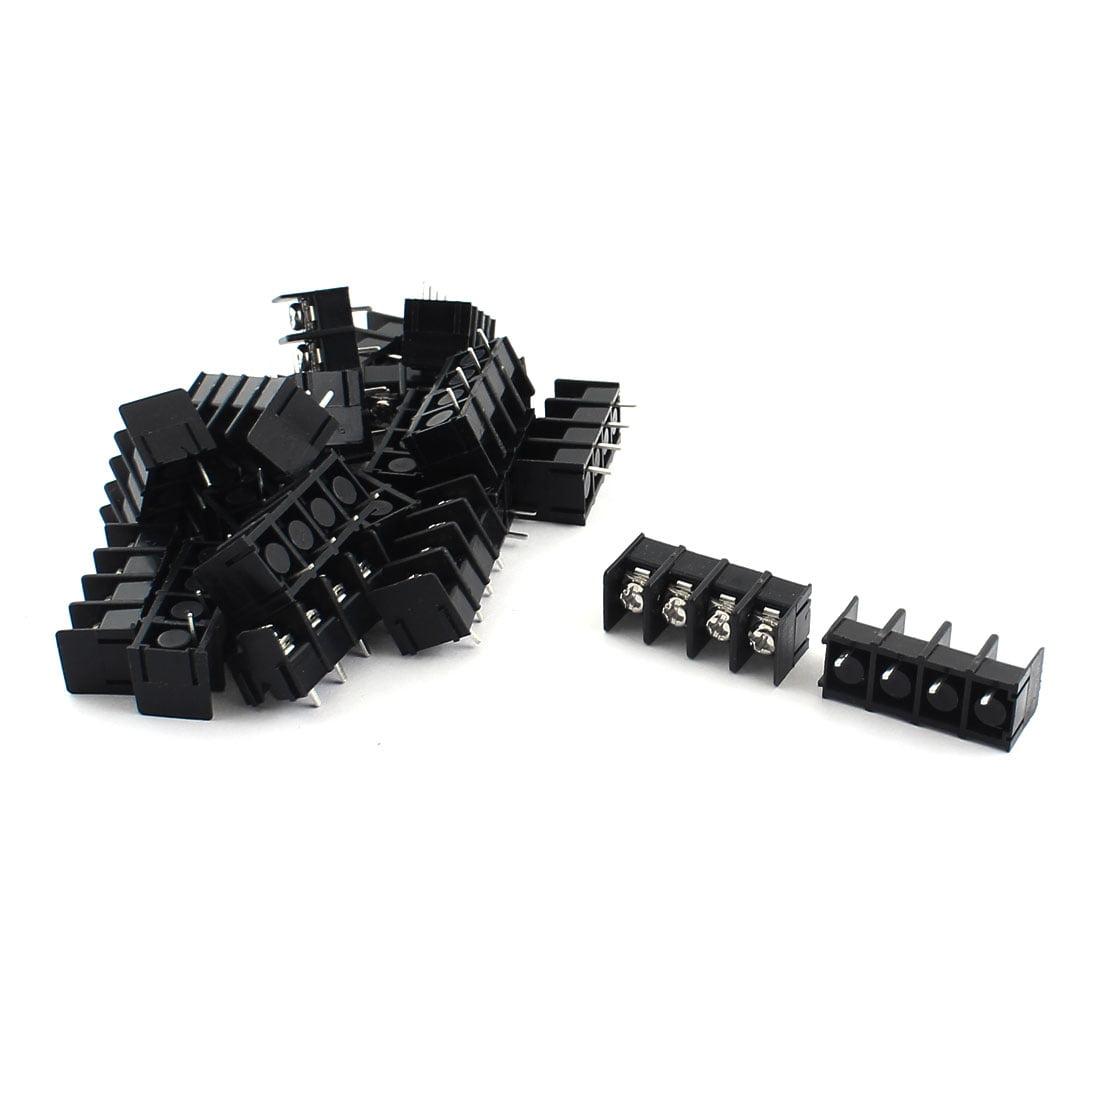 Unique Bargains 20Pcs DG7.62-3P 7.62mm Black Screw Terminal Block Connector 300V 20A AWG22-12